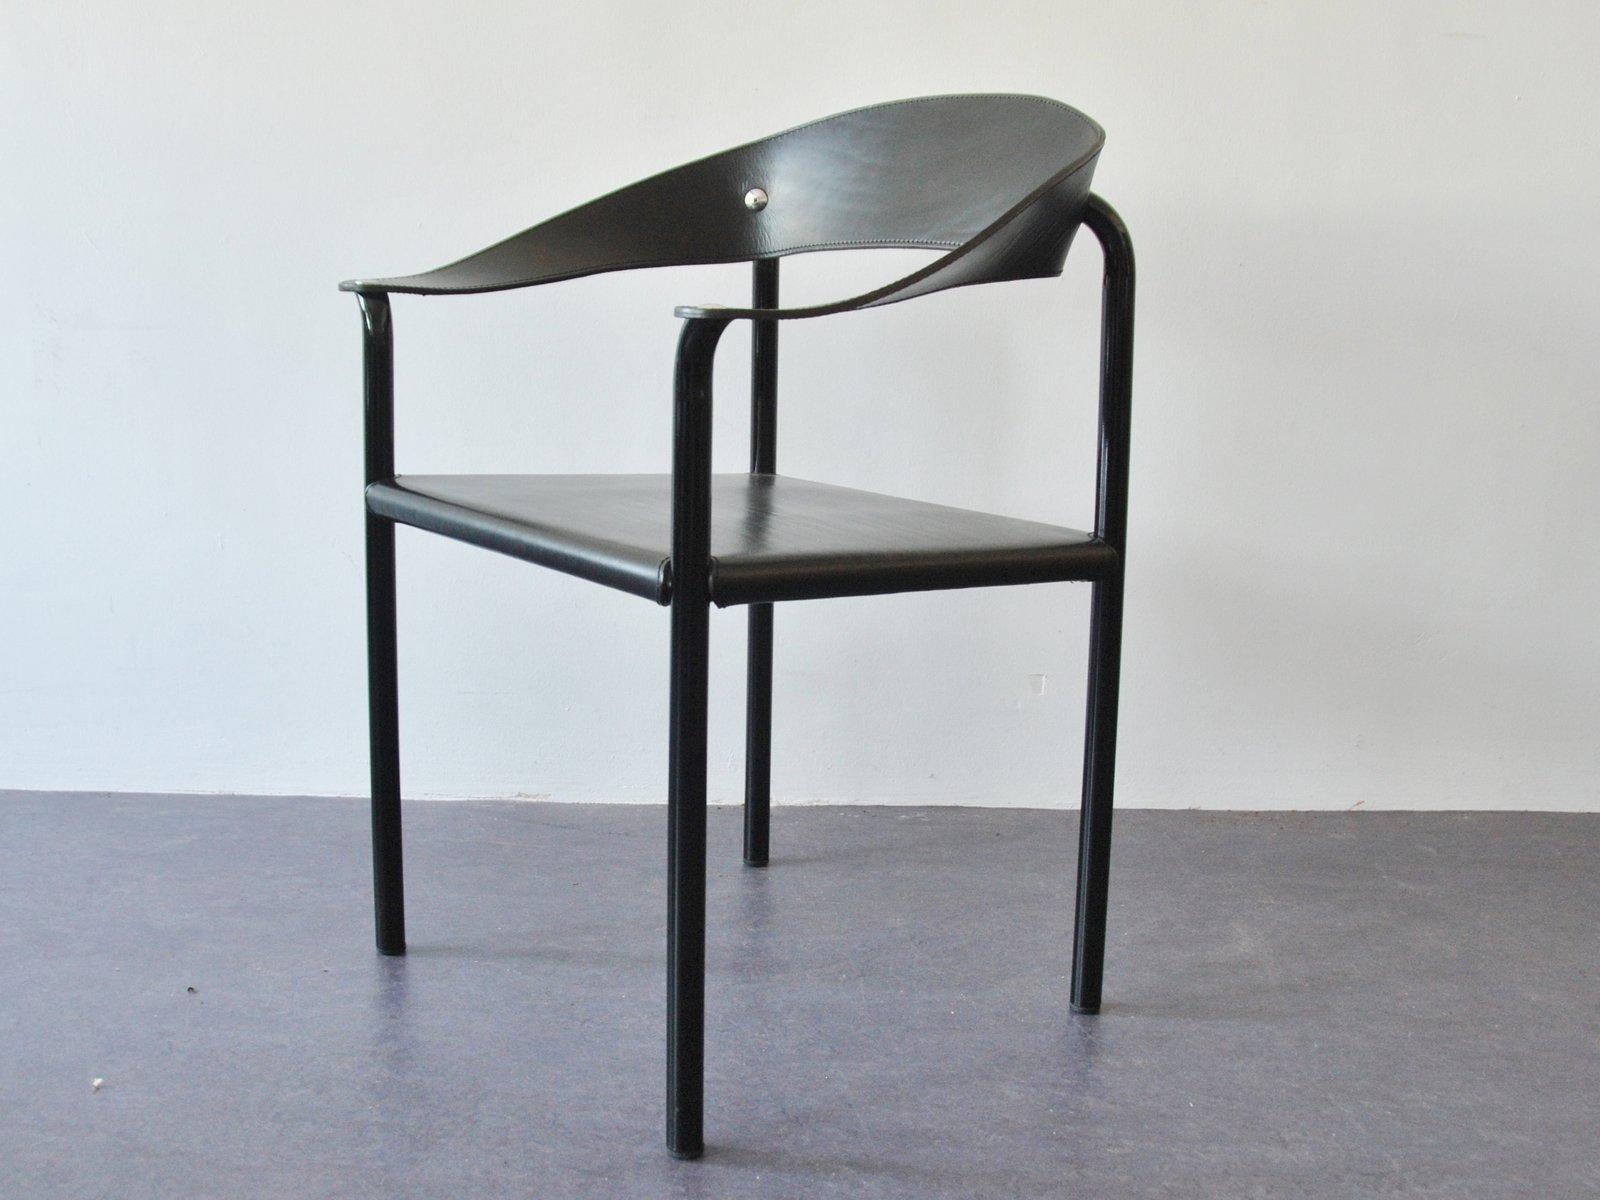 Sedie Di Metallo Vintage : Olivette sedia metallo legno sedie vintage e industriali tunisi